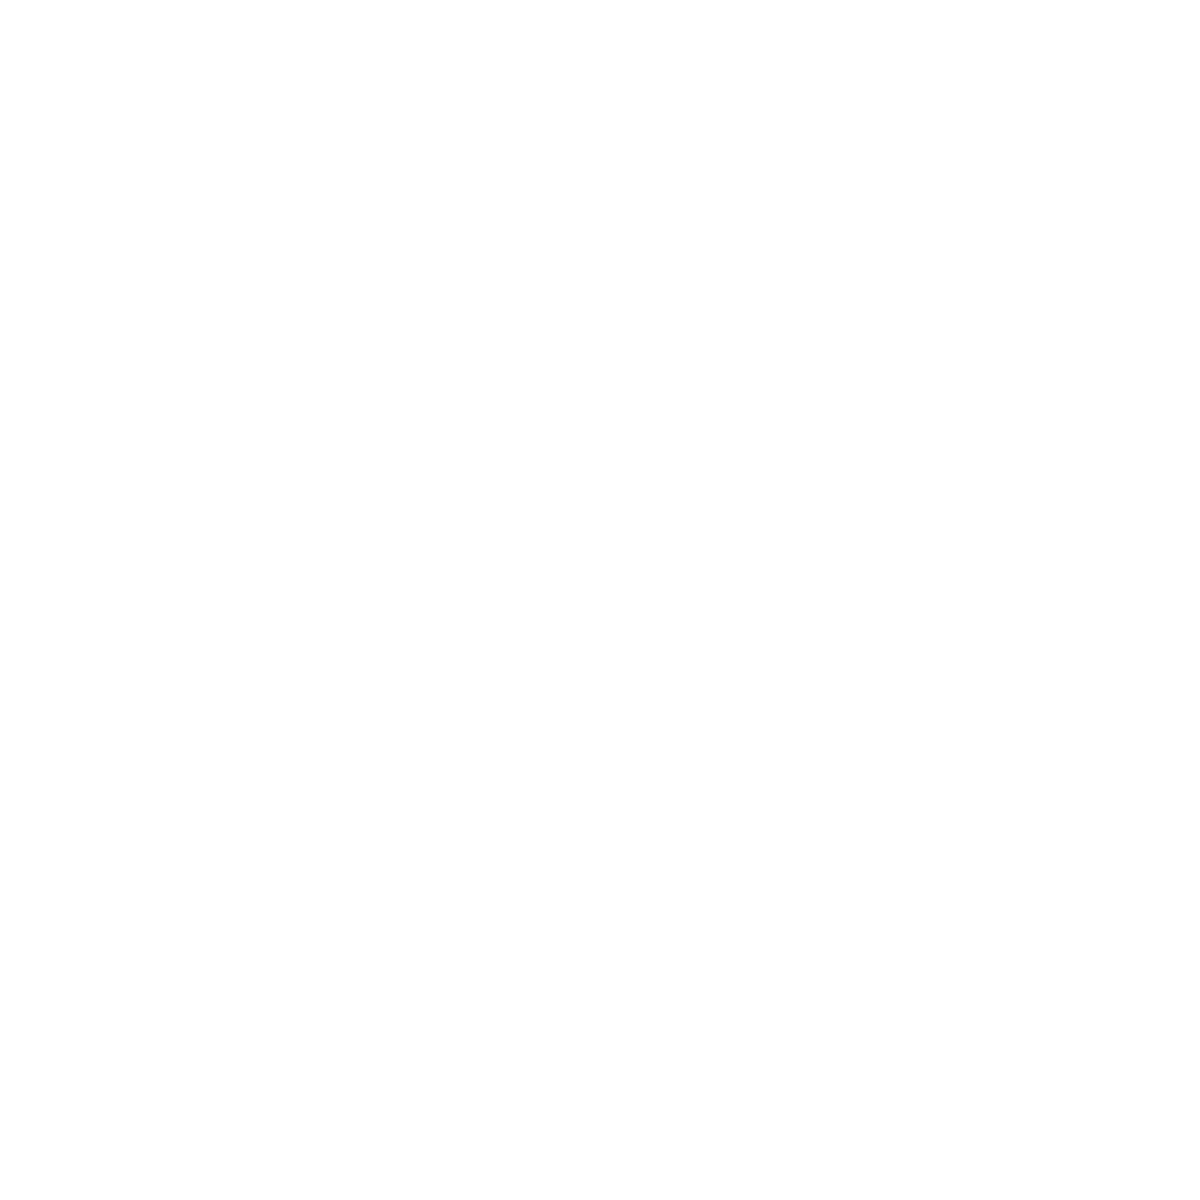 2000s - Elton John